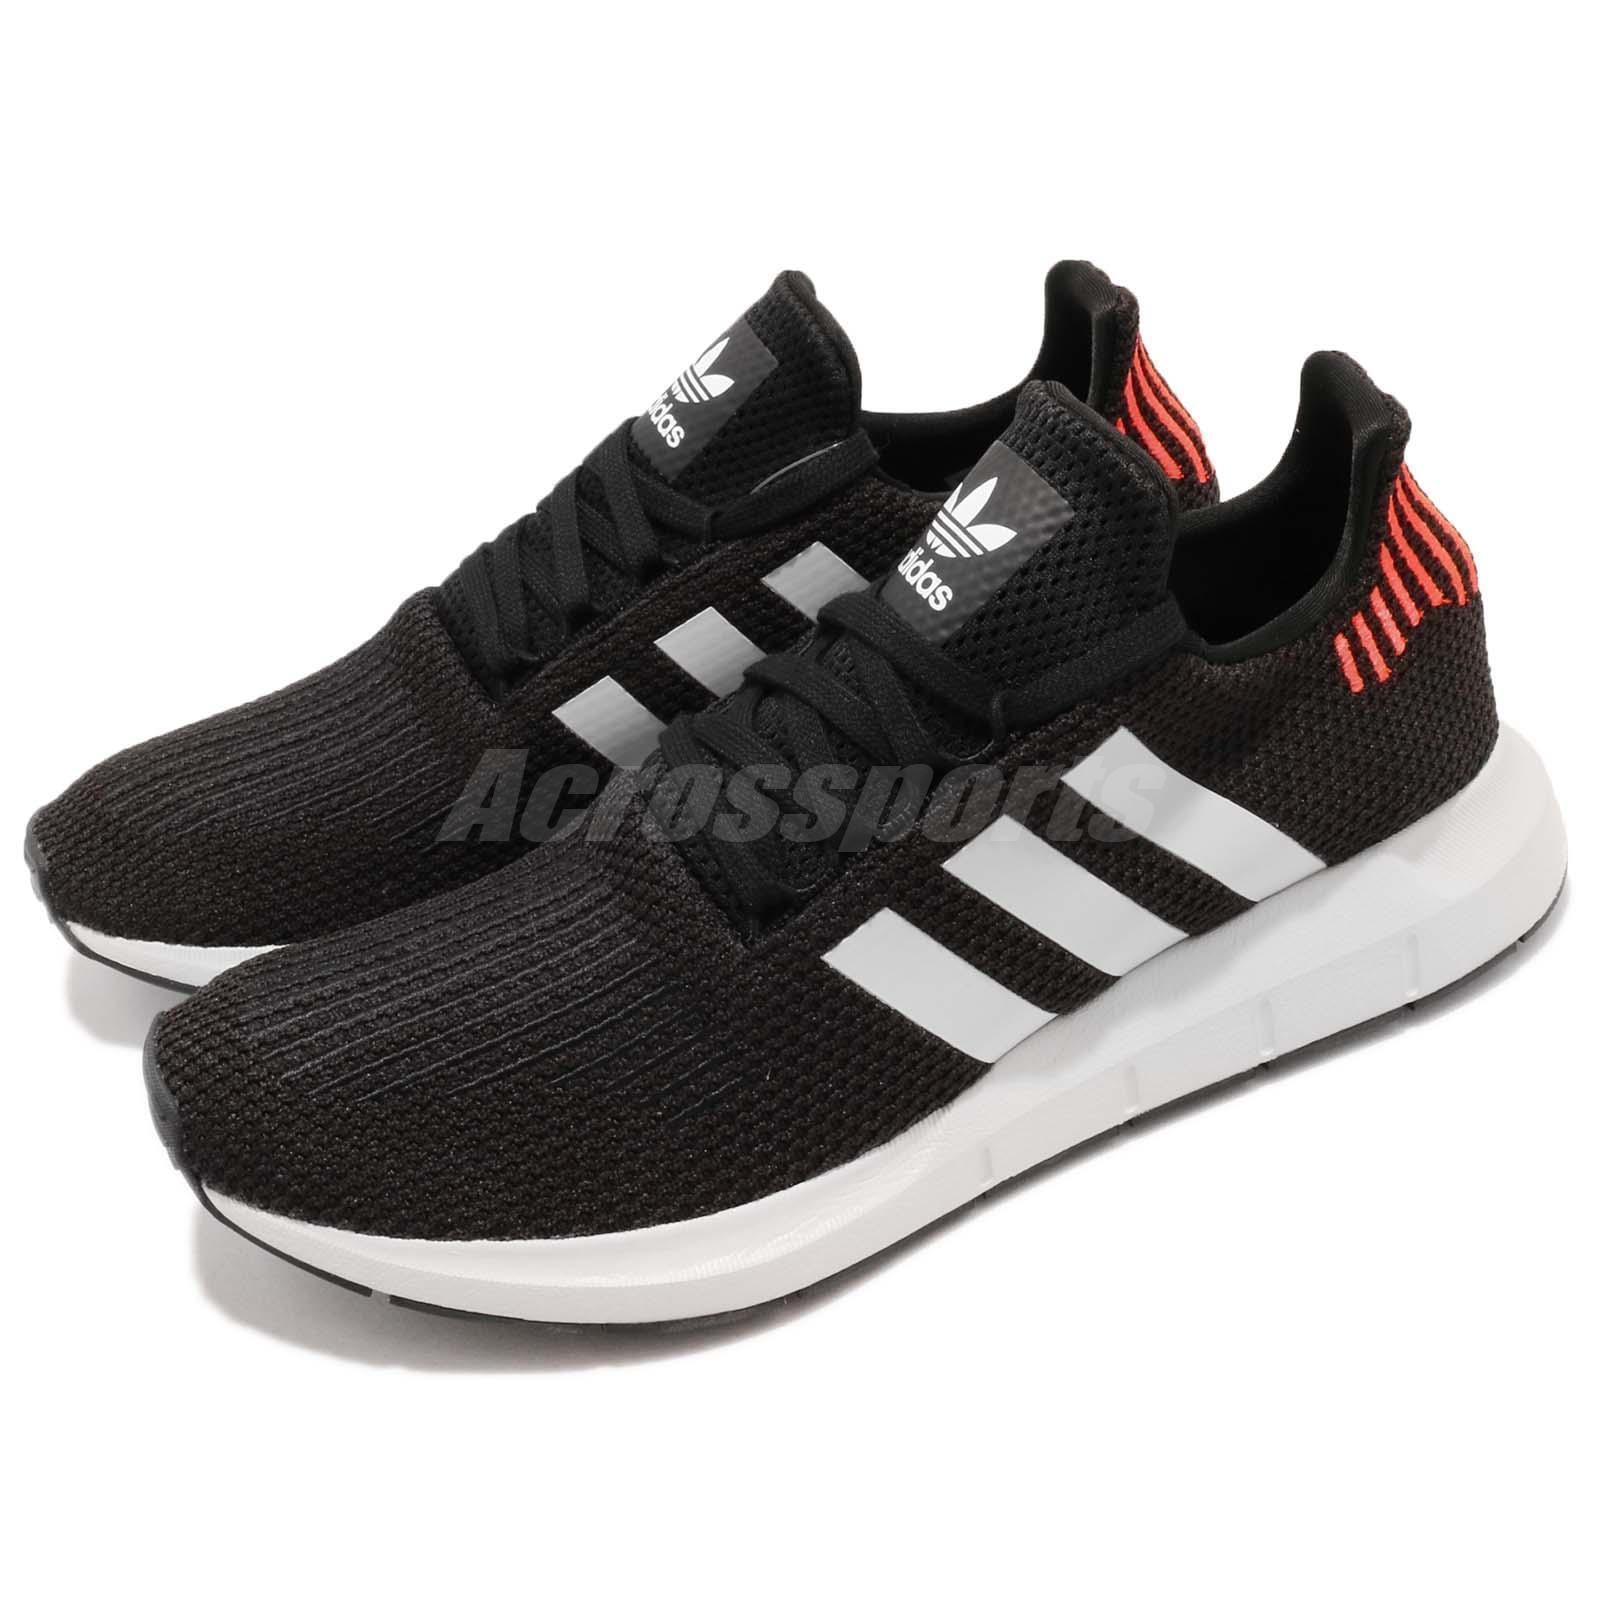 adidas Originals Swift Run Noir Blanc Homme Chaussures de course à pied Sneaker B37730